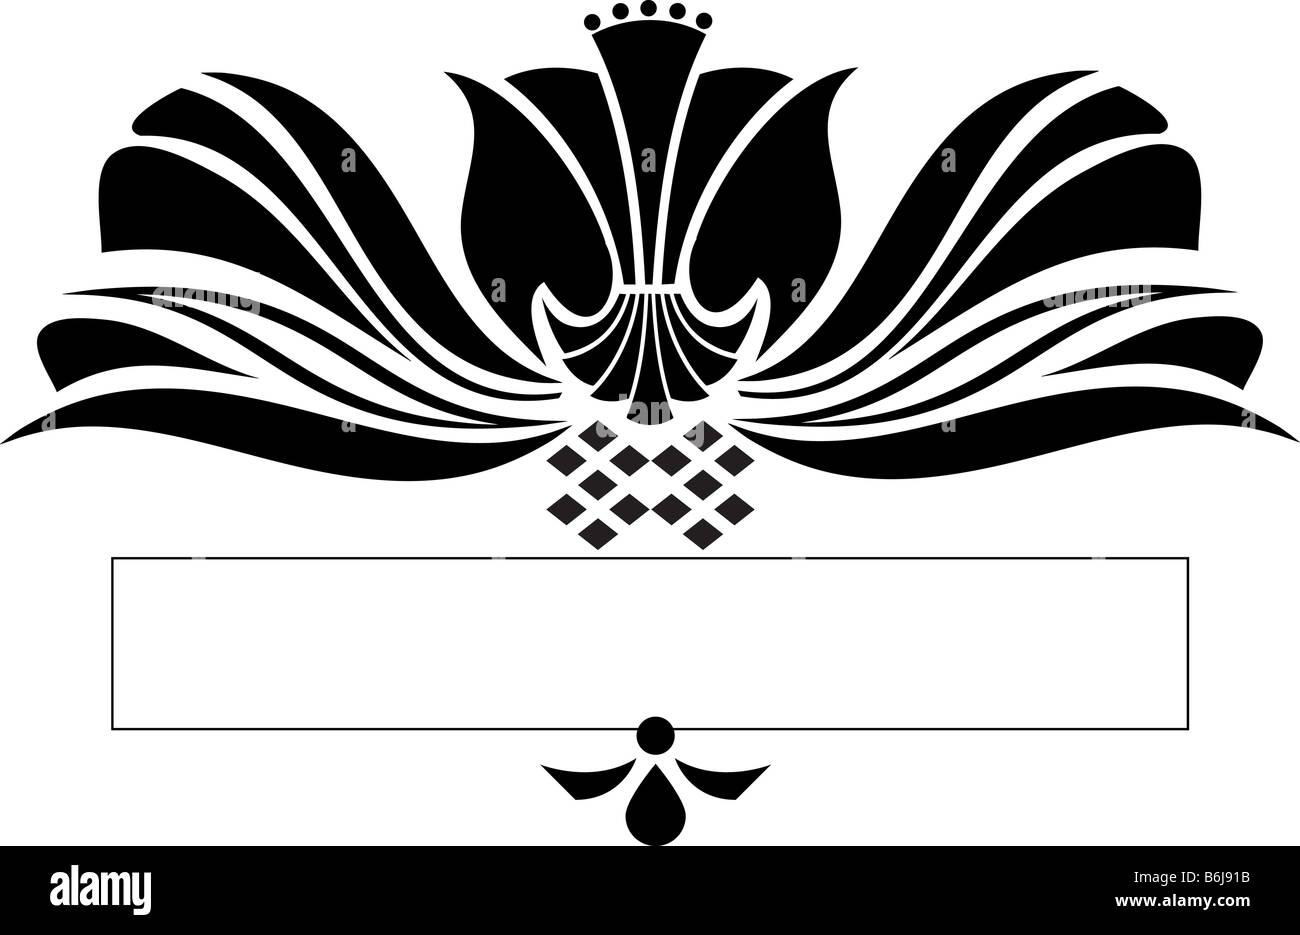 scroll design - Stock Image